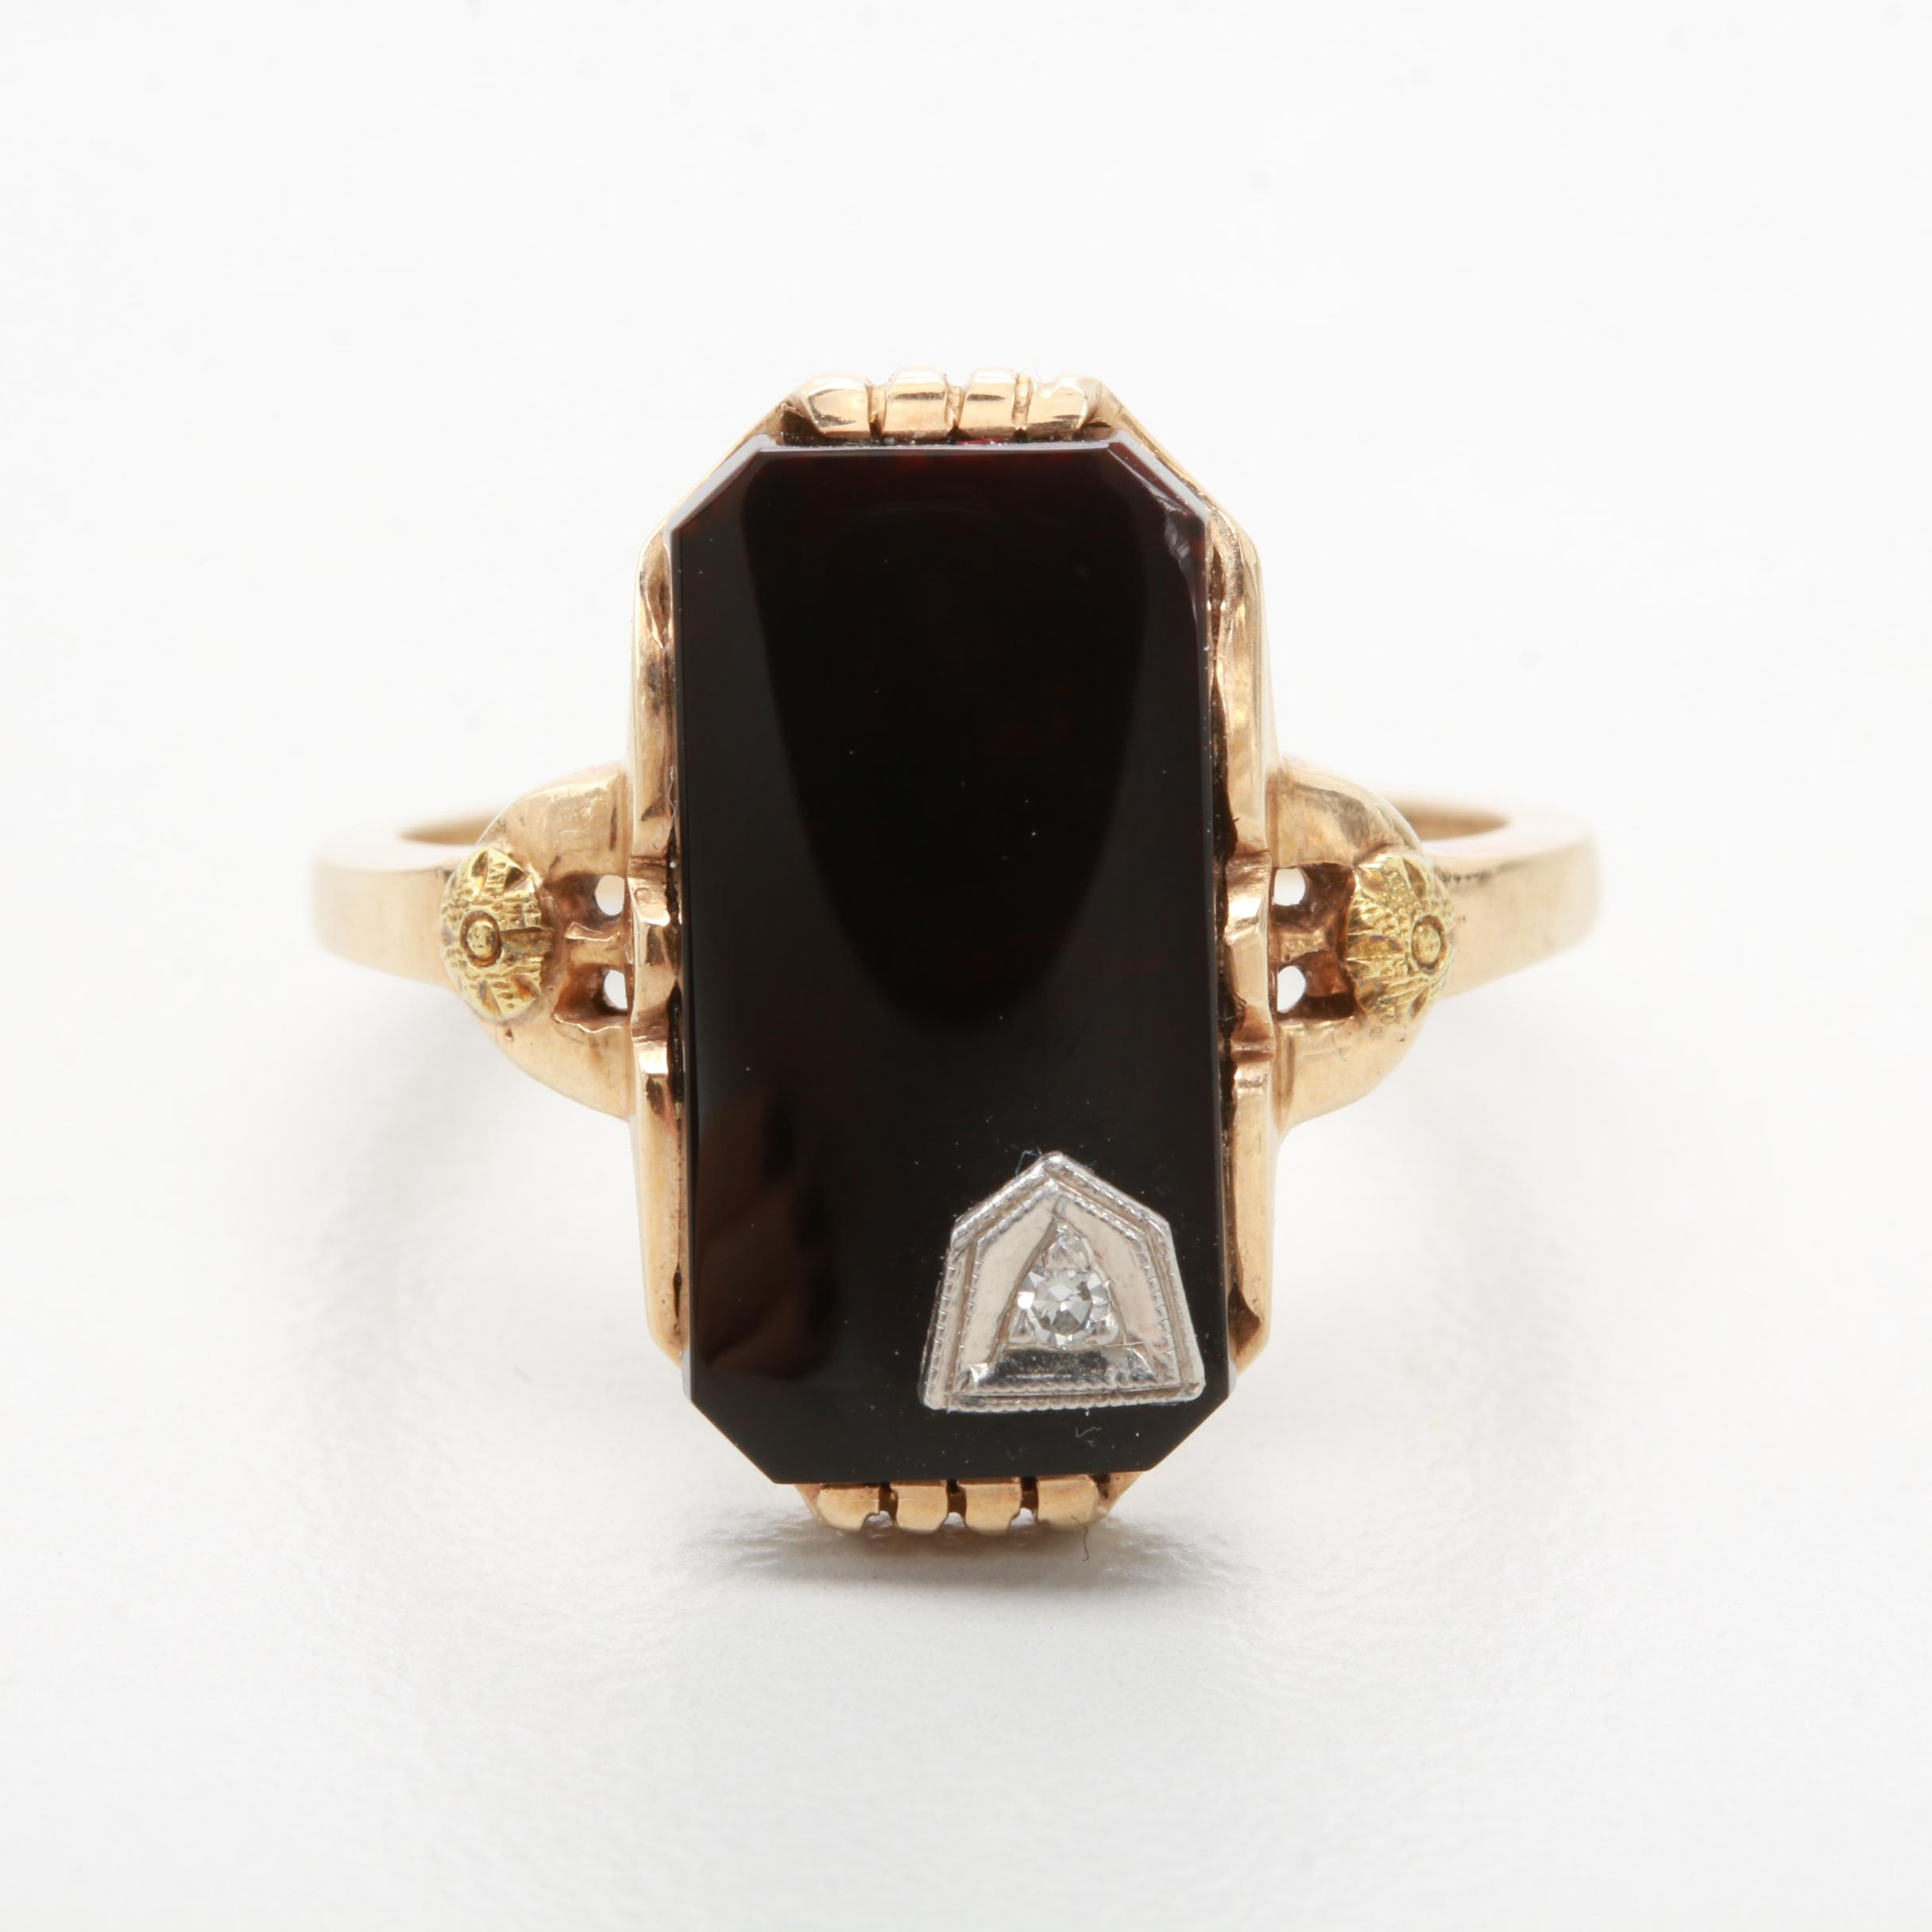 Art Deco 10K Yellow and White Gold Black Onyx Diamond Ring